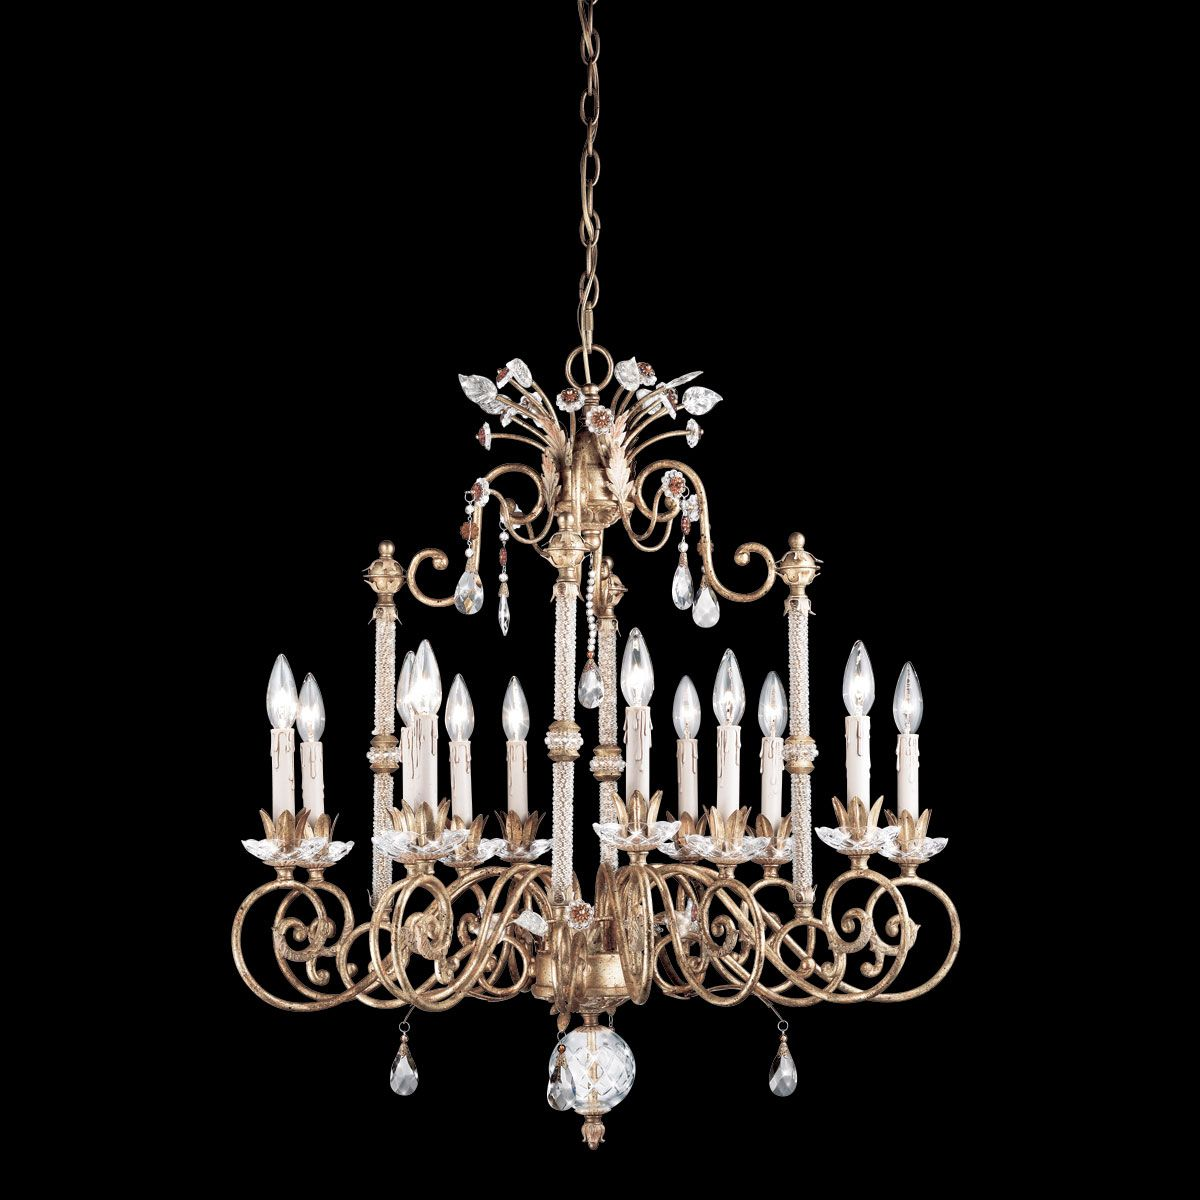 Products lighting lighting chandelier lighting island lighting